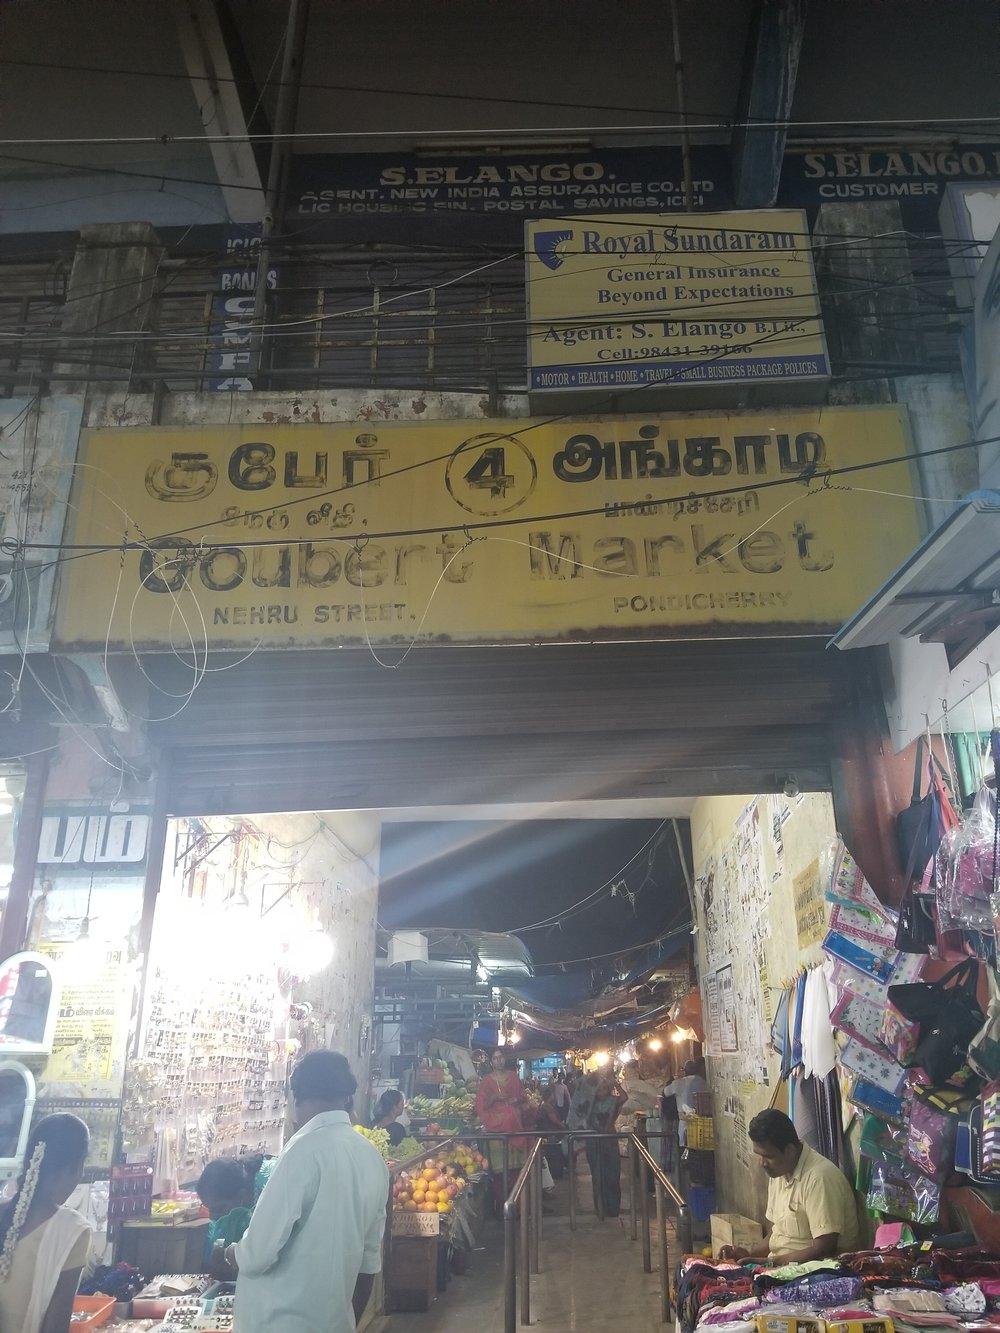 Goubert Market, best place to shop for fruits & veggies!